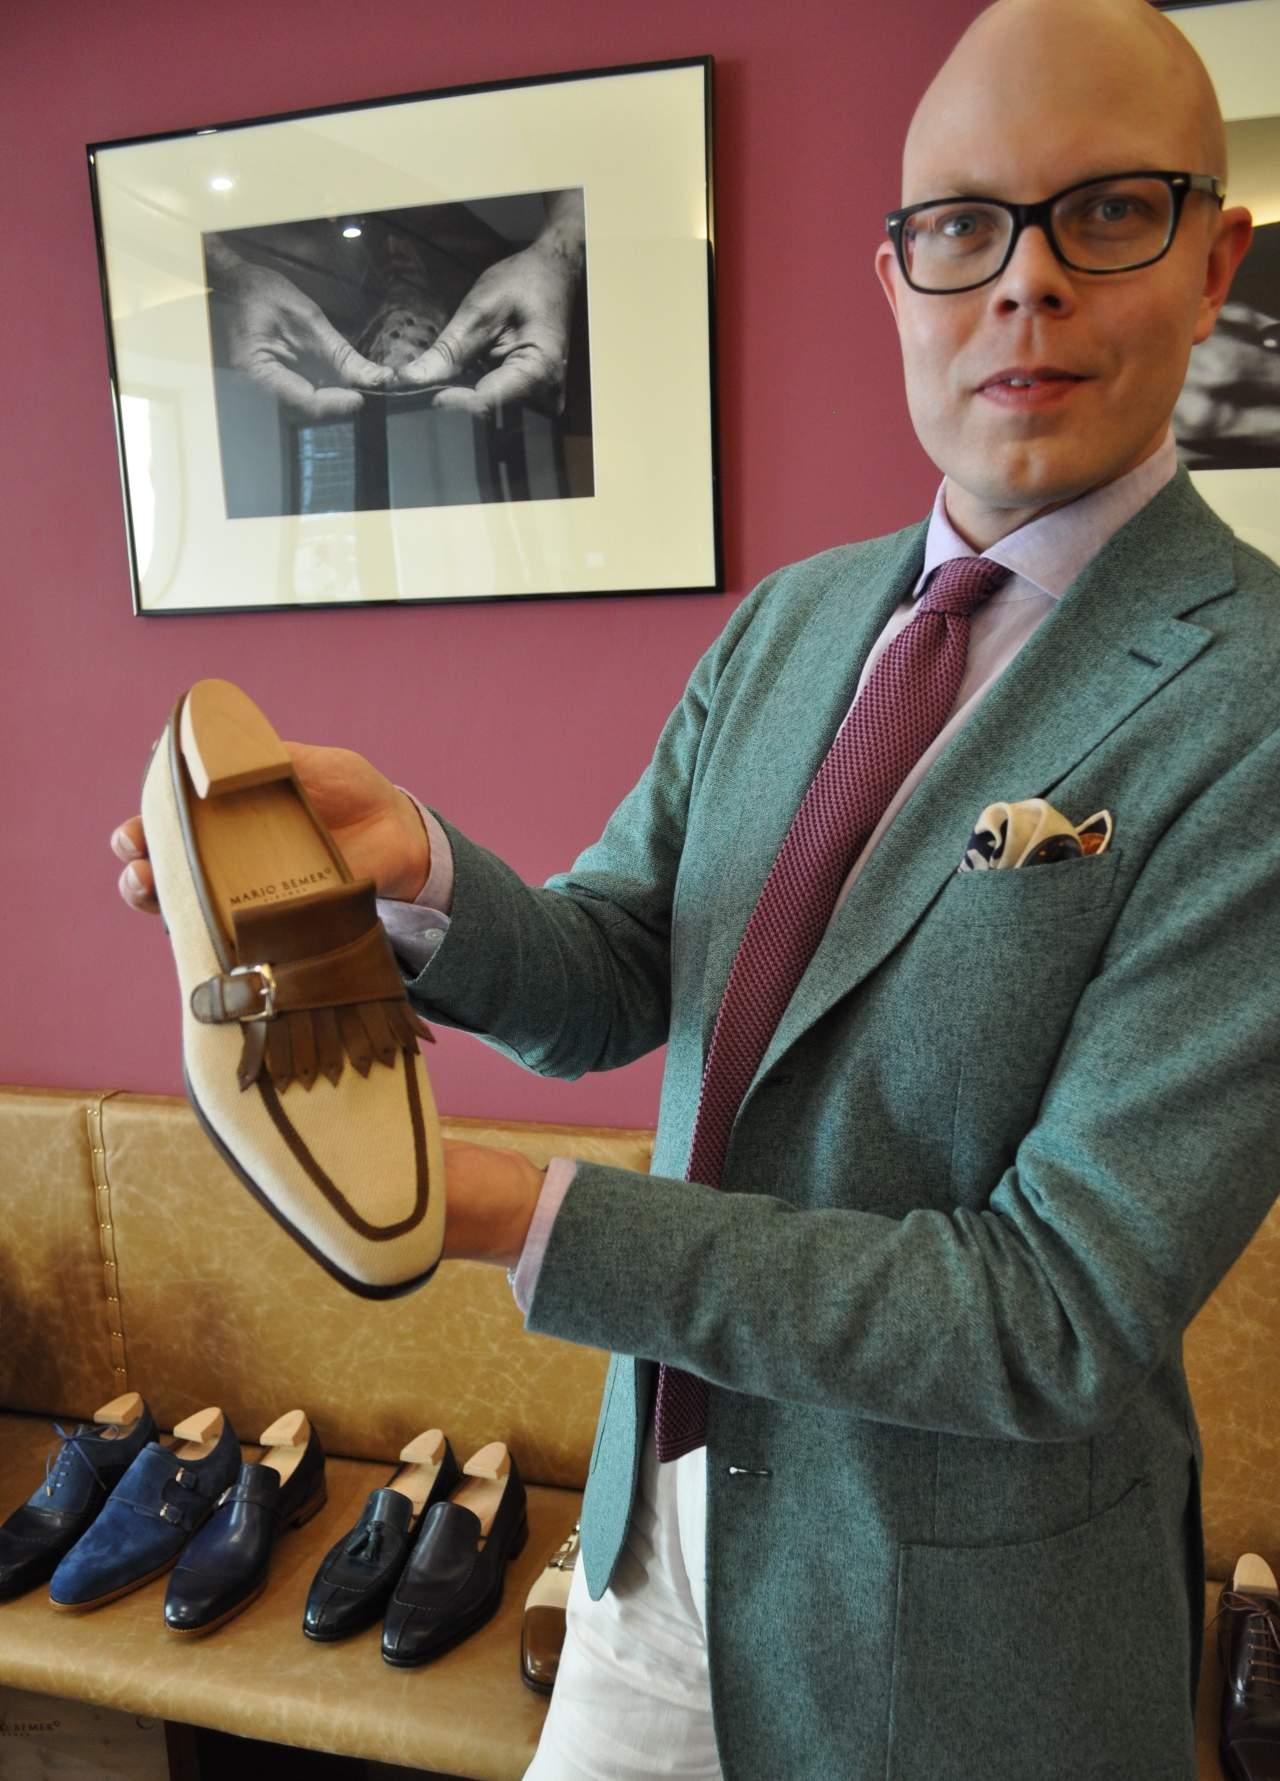 Mario Bemer kiltie loafer